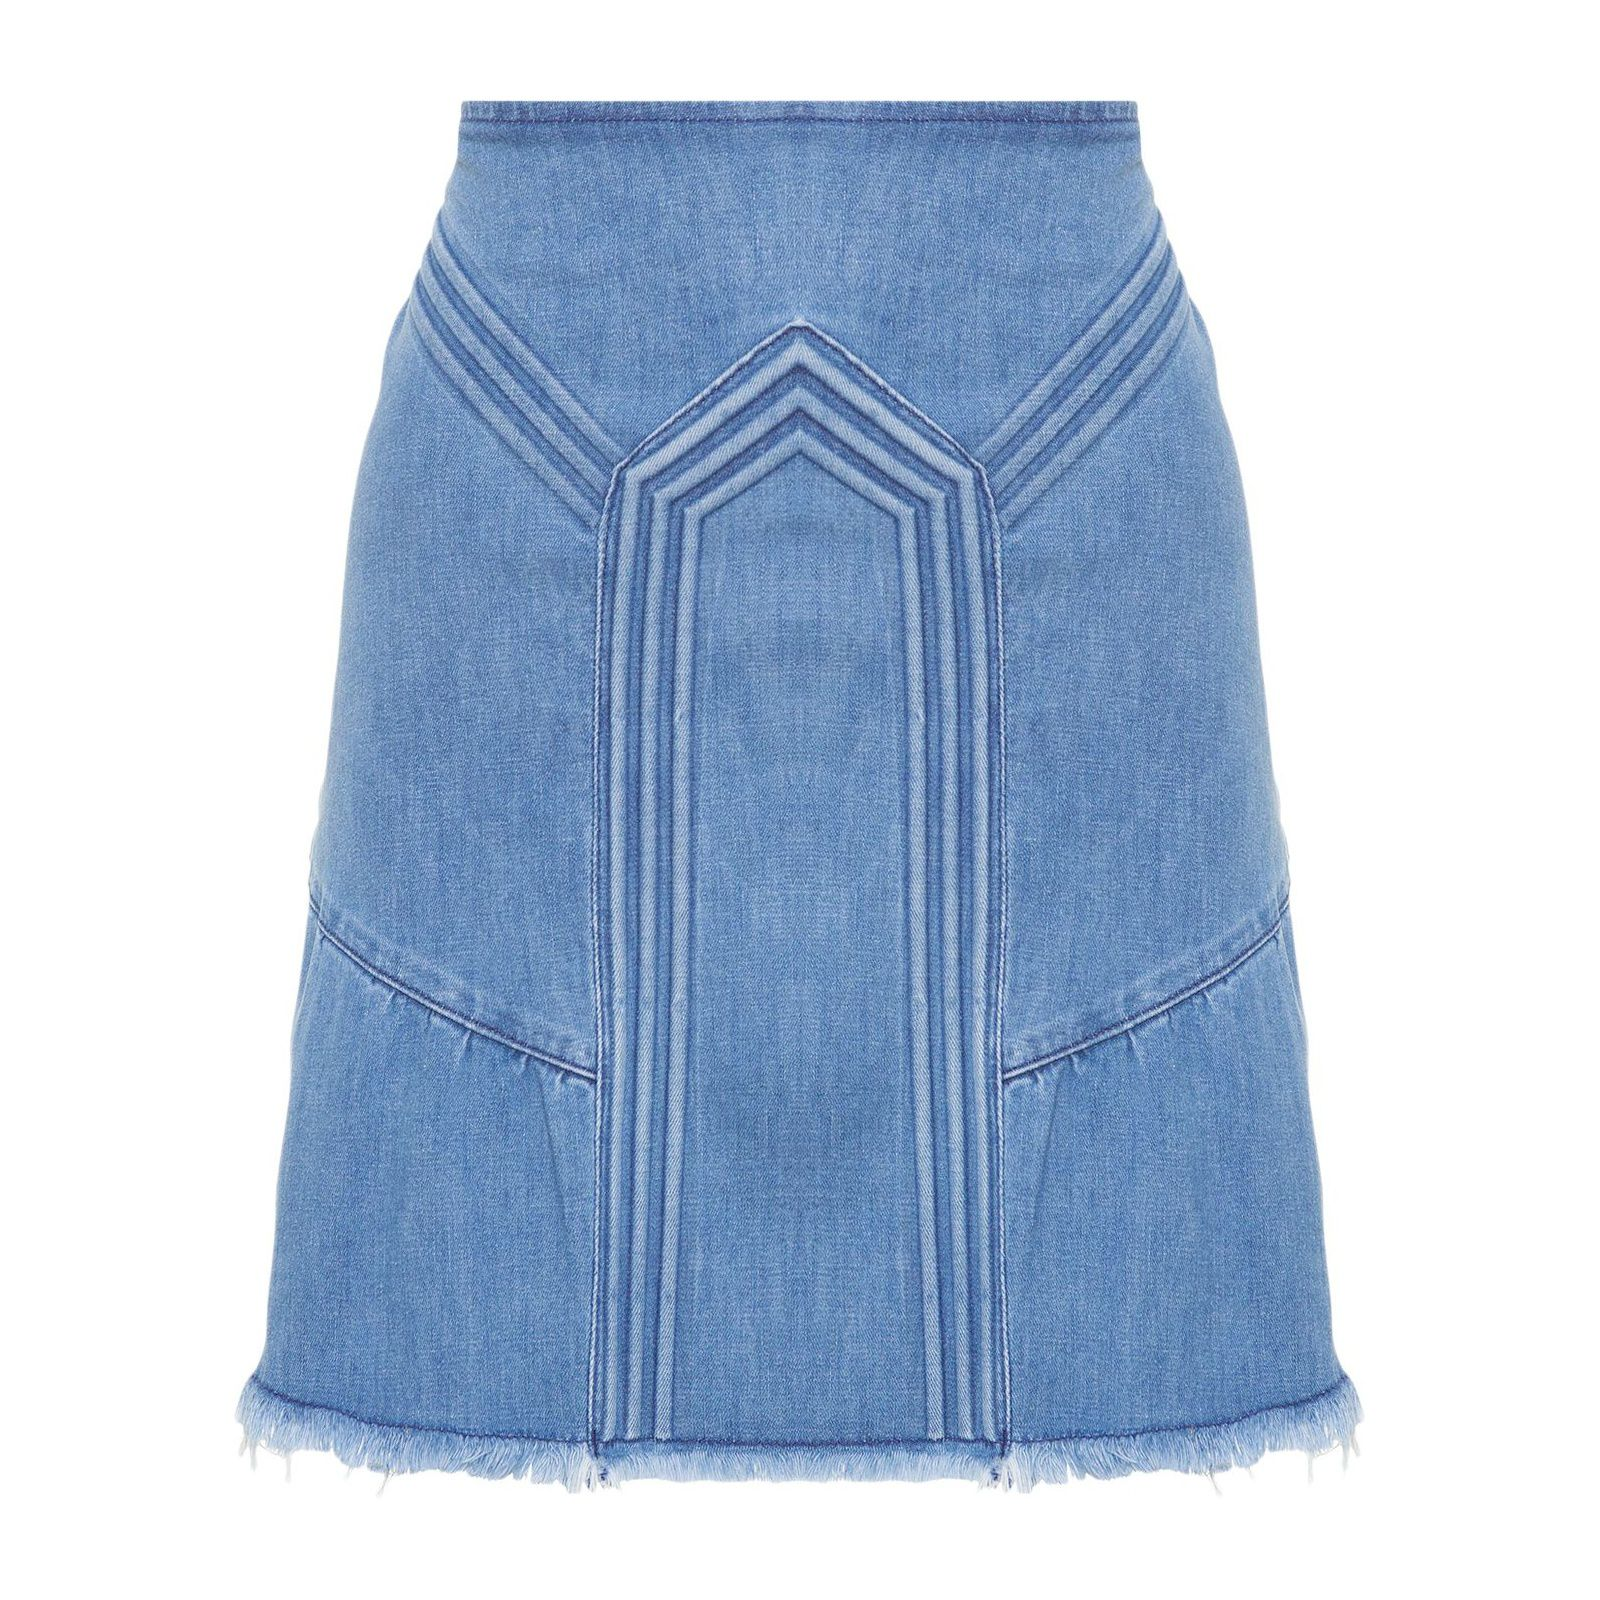 Saia Jeans Embolsing - Azul